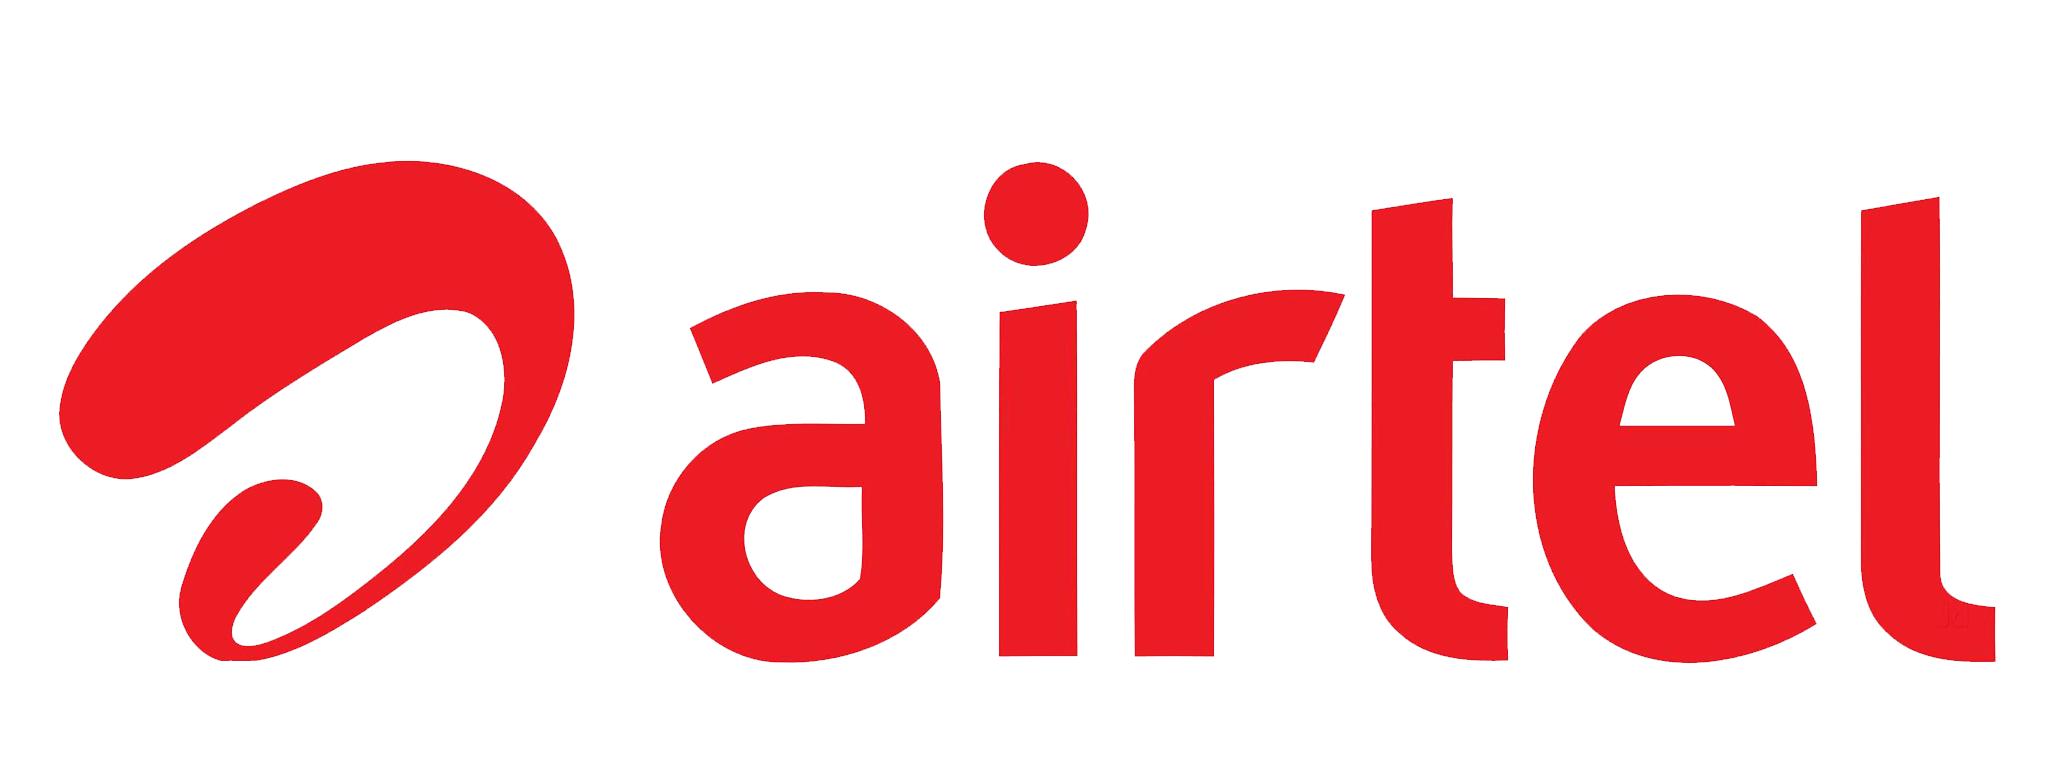 Airtel Logo PNG, Airtel Transparent Logo Free Download searchpng.com.